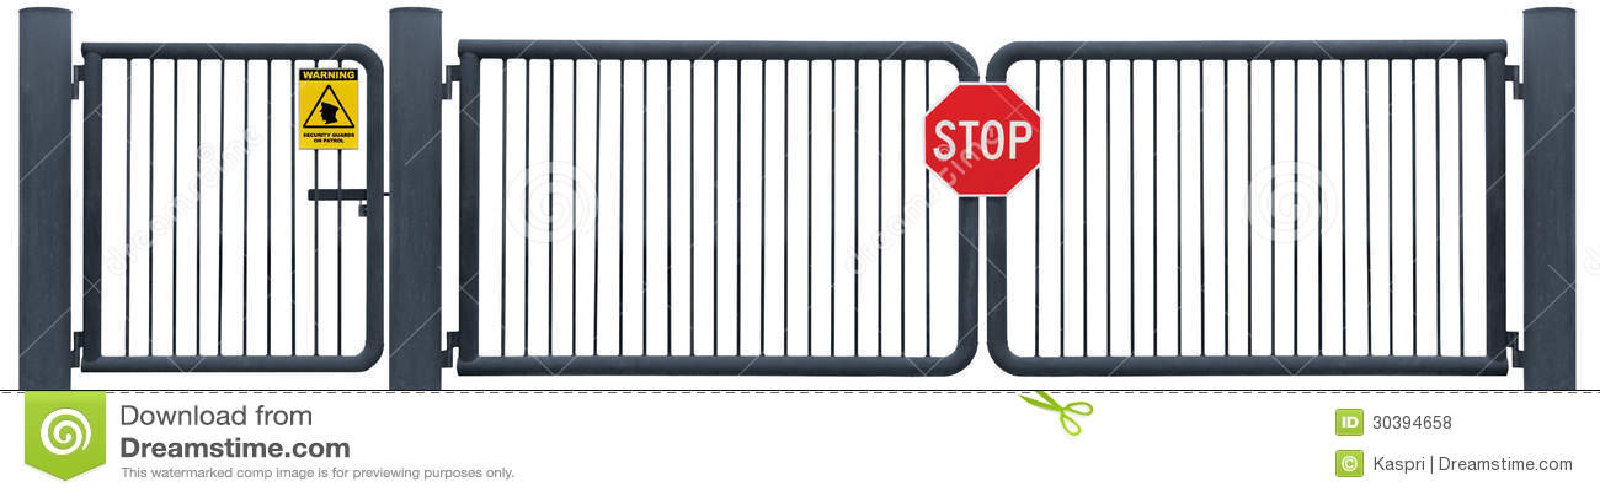 Pin stop sign grunge on pinterest